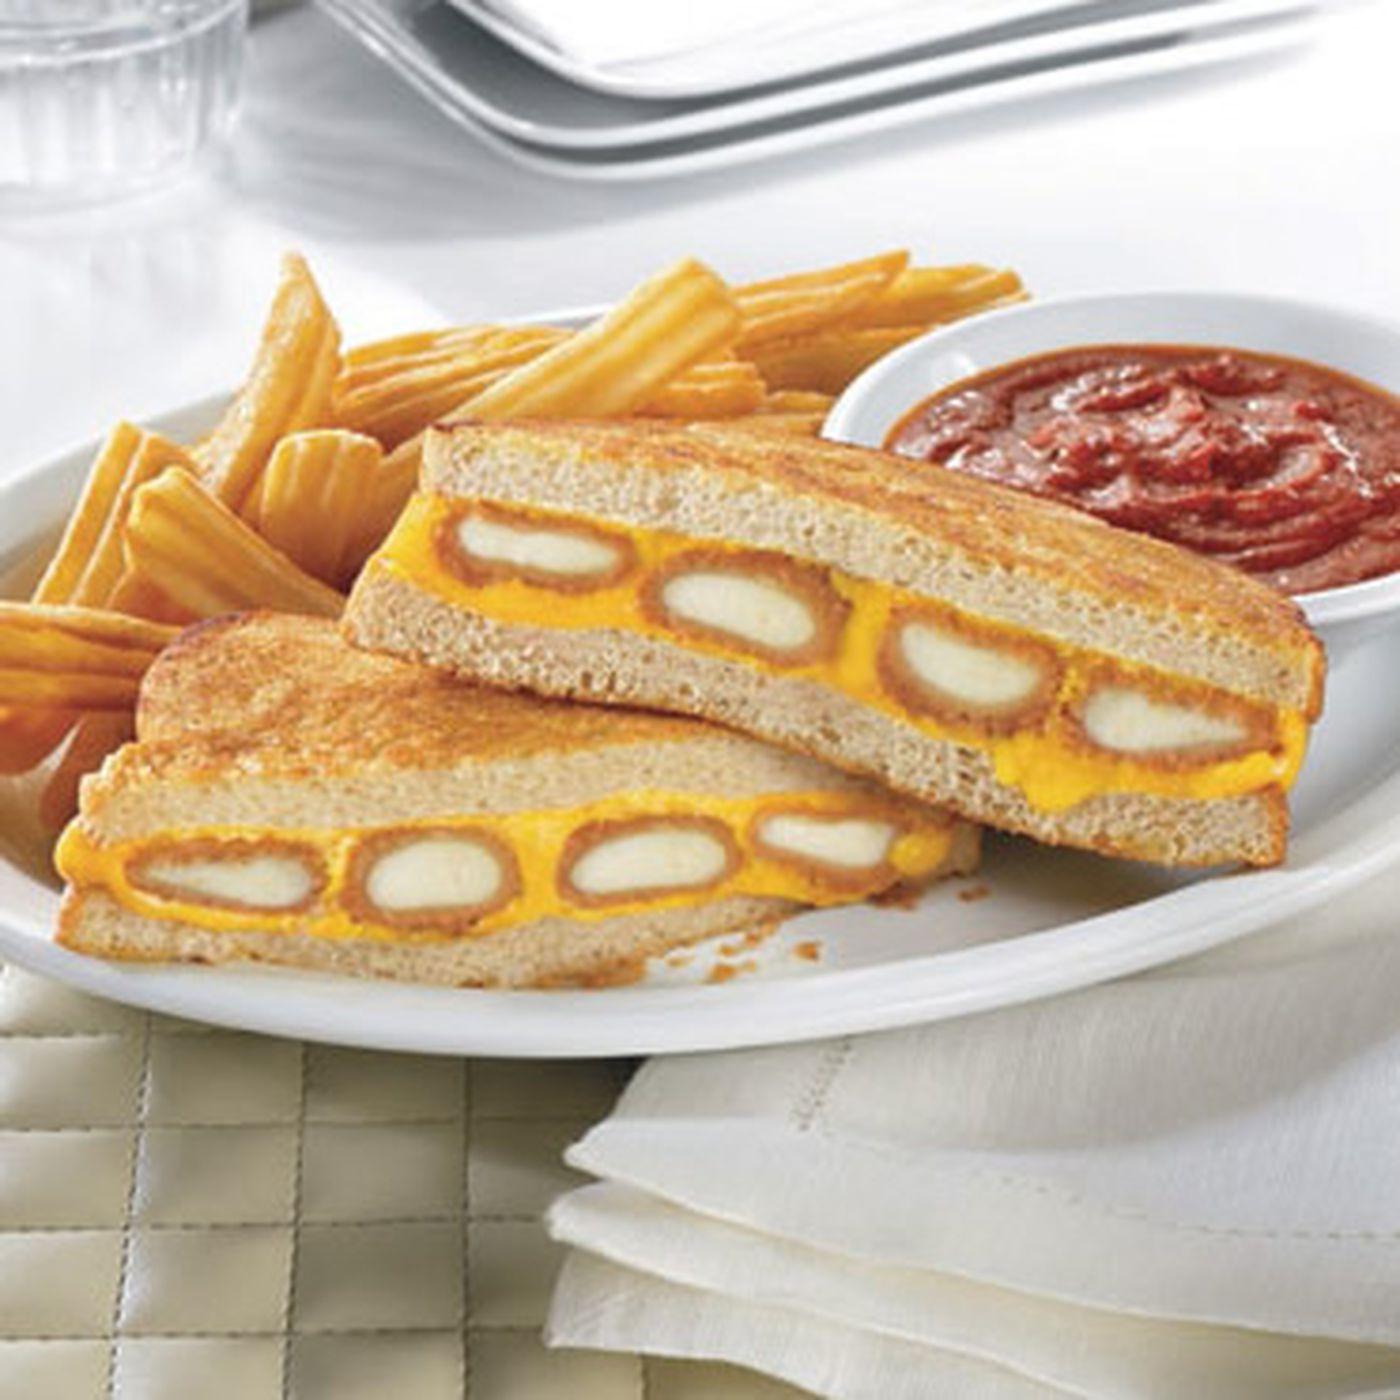 The Fried Cheese Melt Sandwich From Dennys Sneaks Mozzarella Sticks